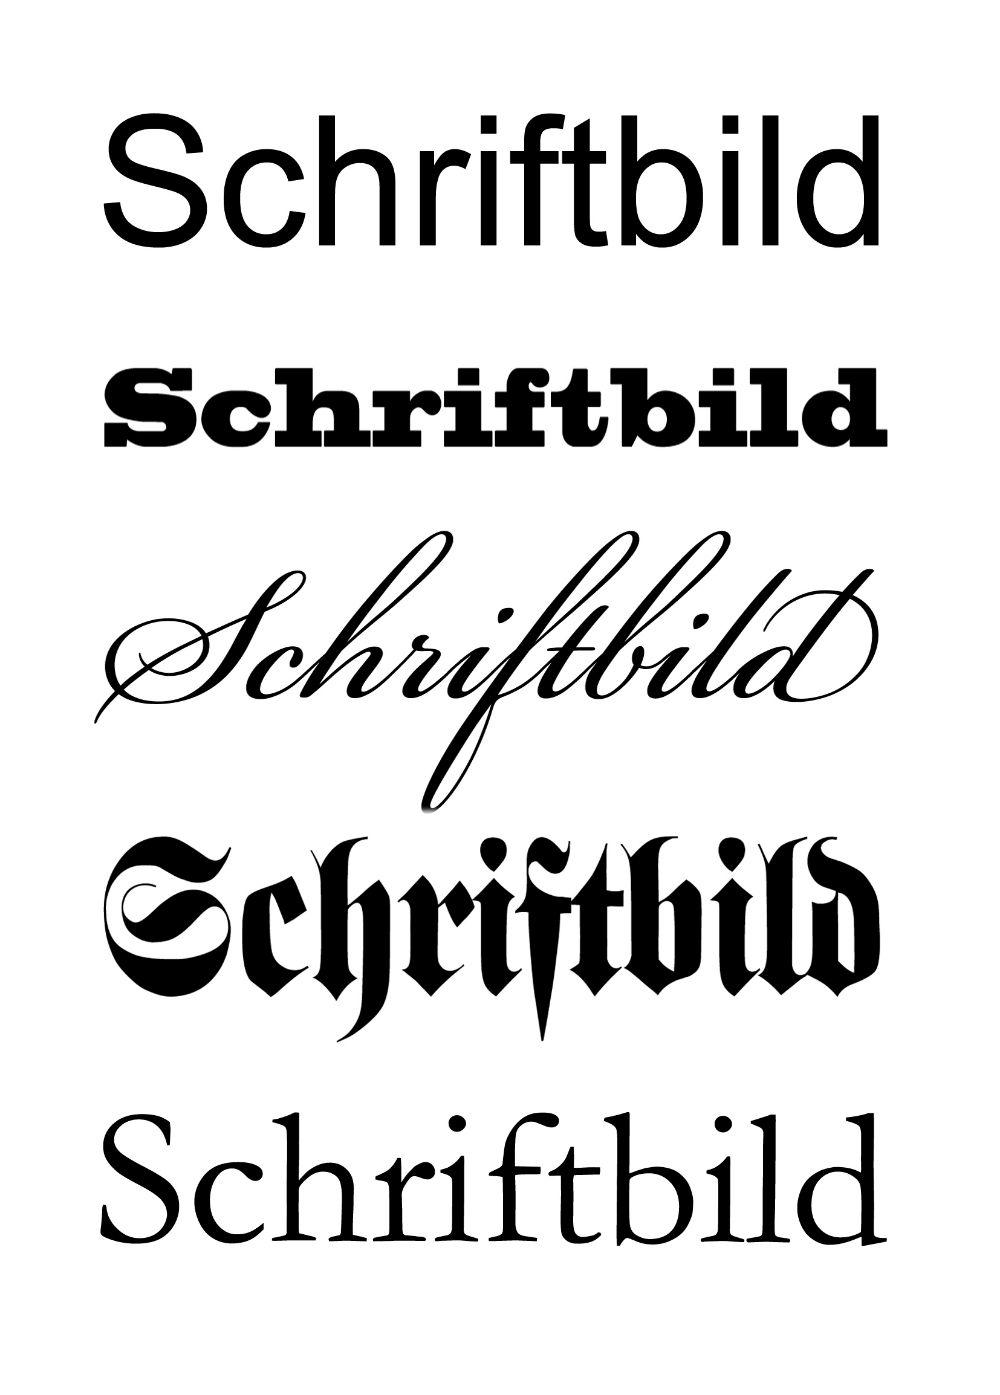 ADA Compliant Website - focus on fonts